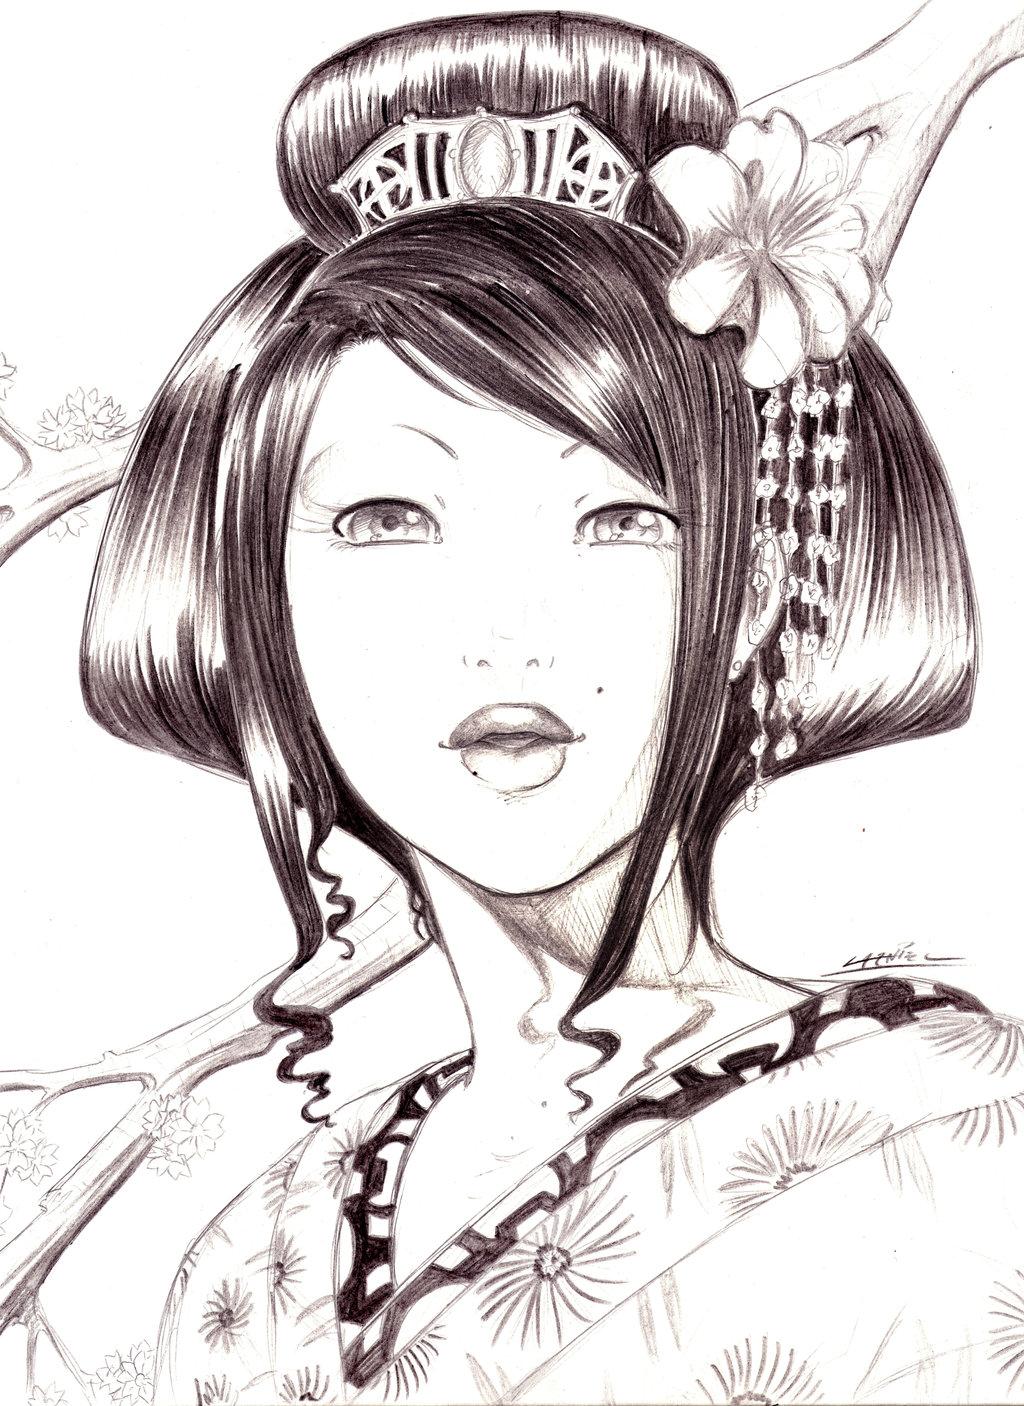 Drawn geisha Com deviantart sanozukeloco @deviantART Geisha